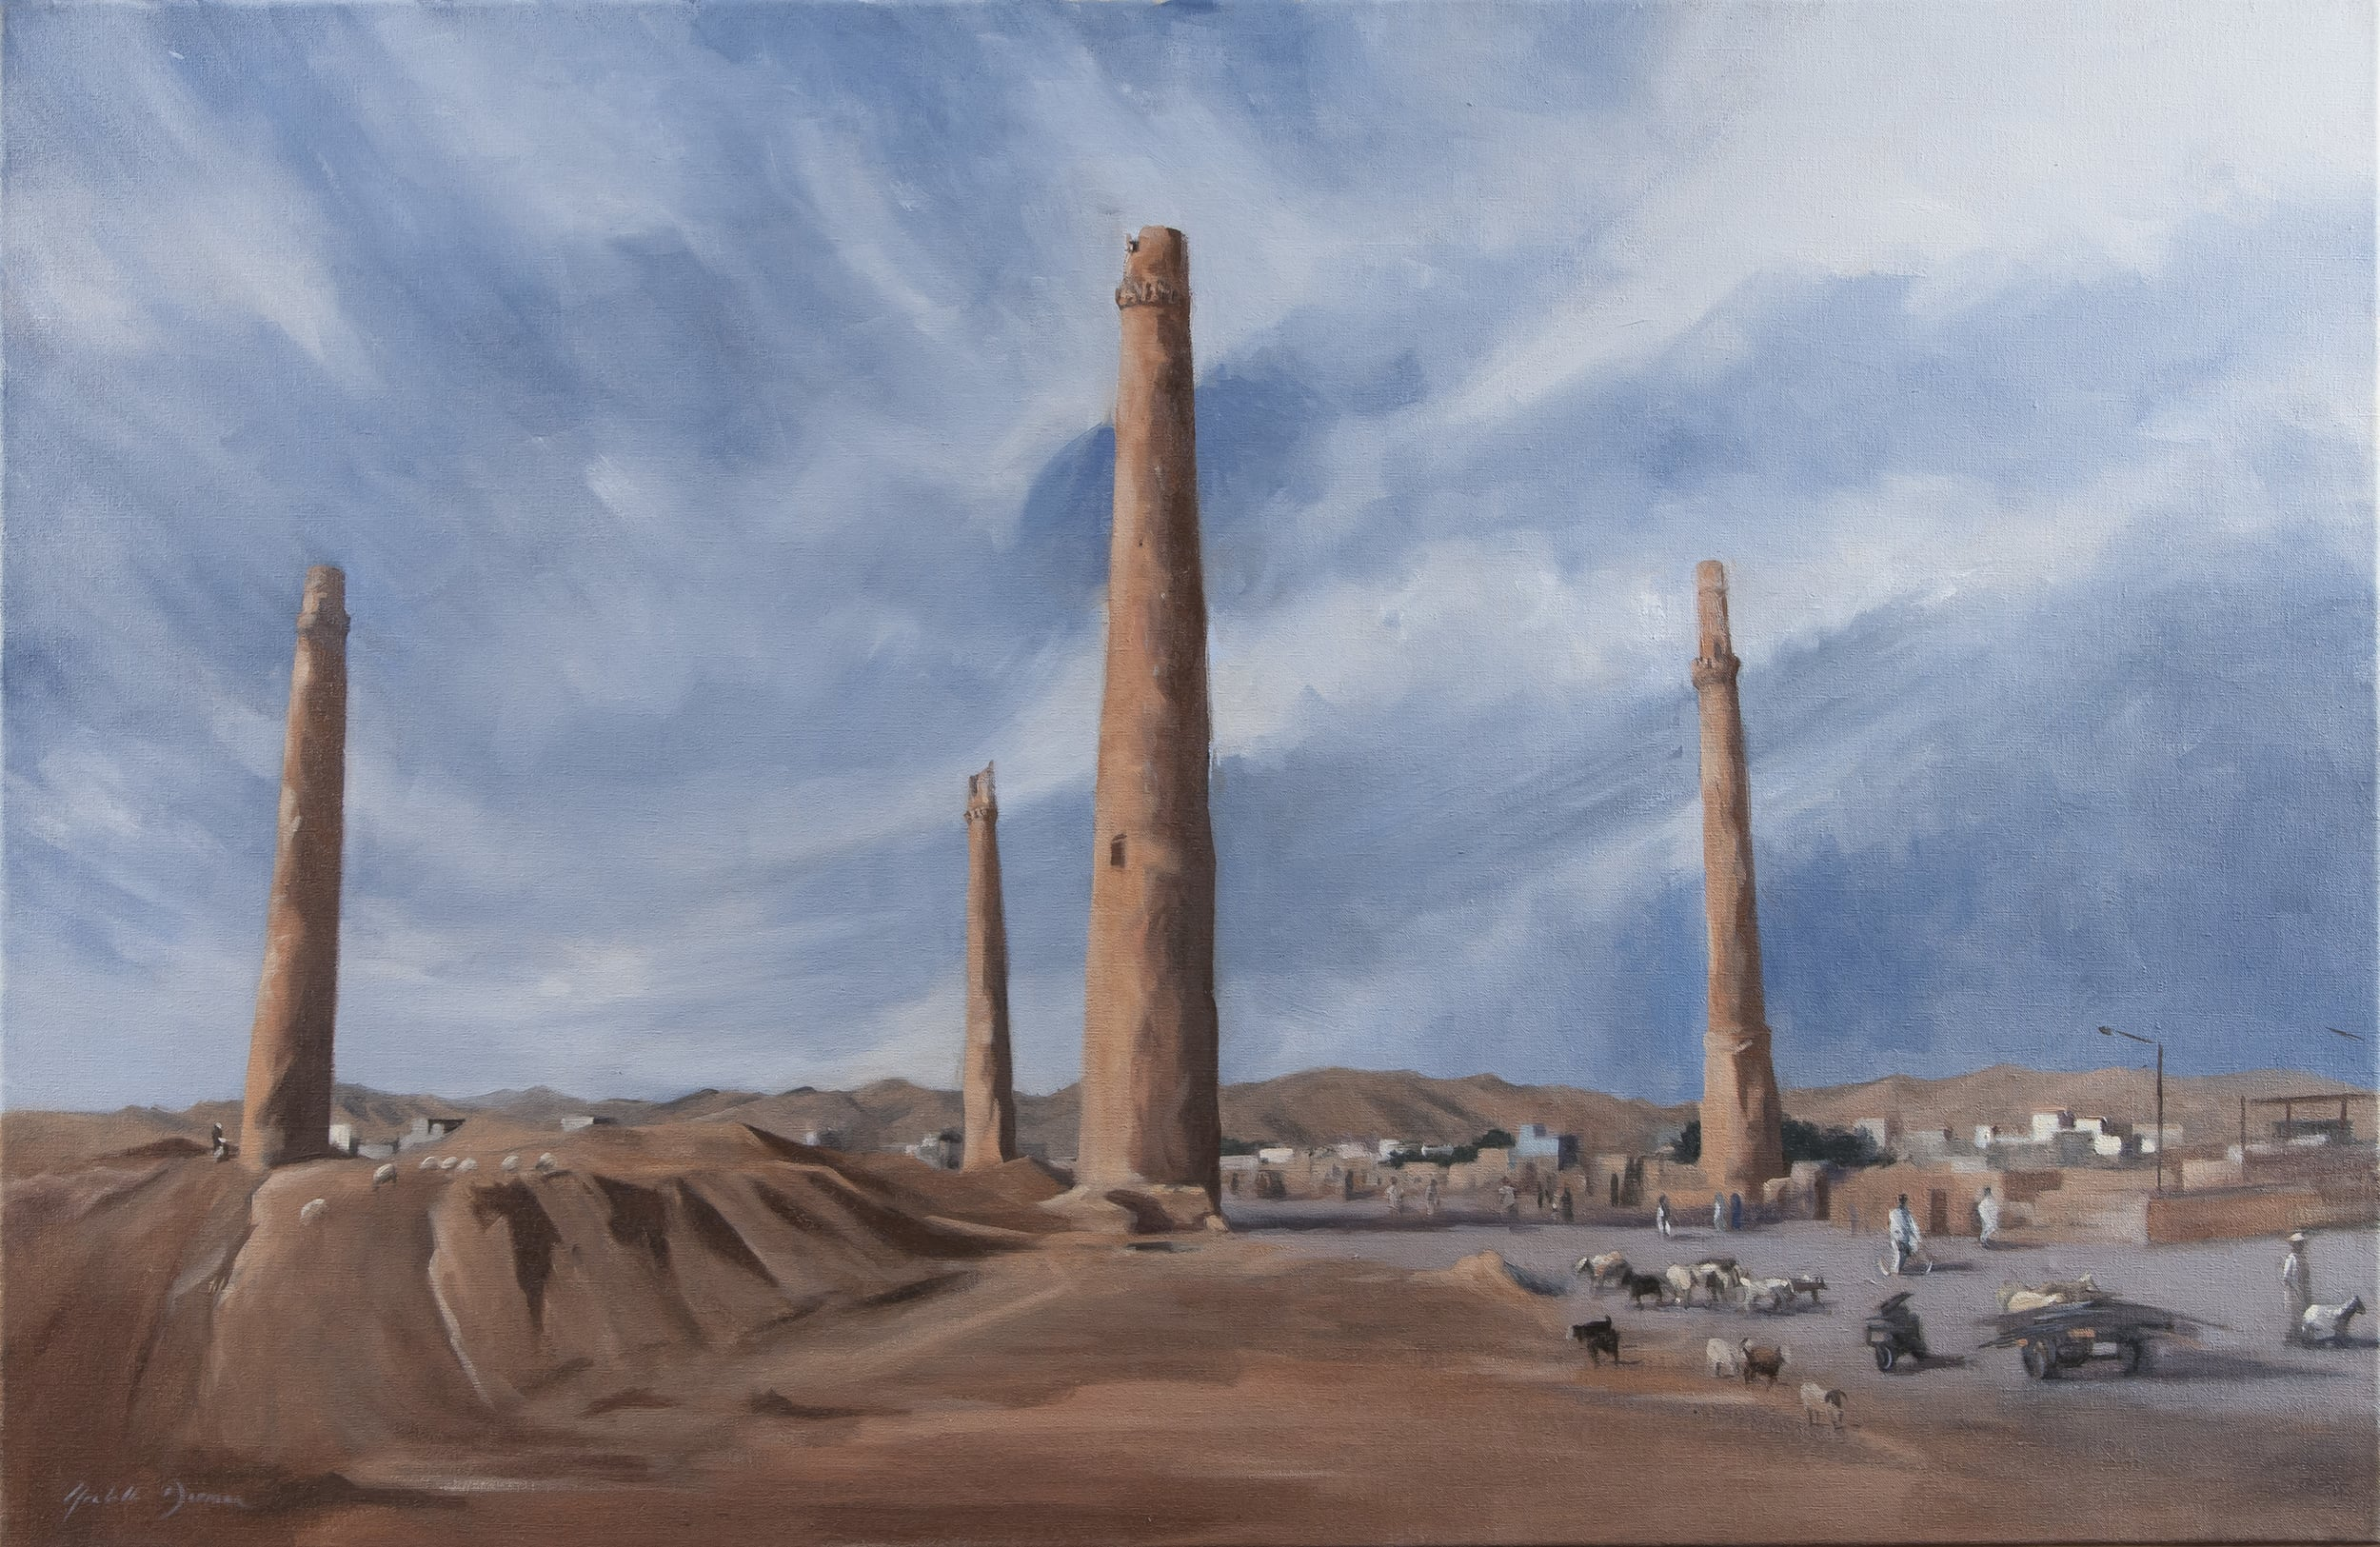 The Musallah Complex, Herat, 2010, Afghanistan